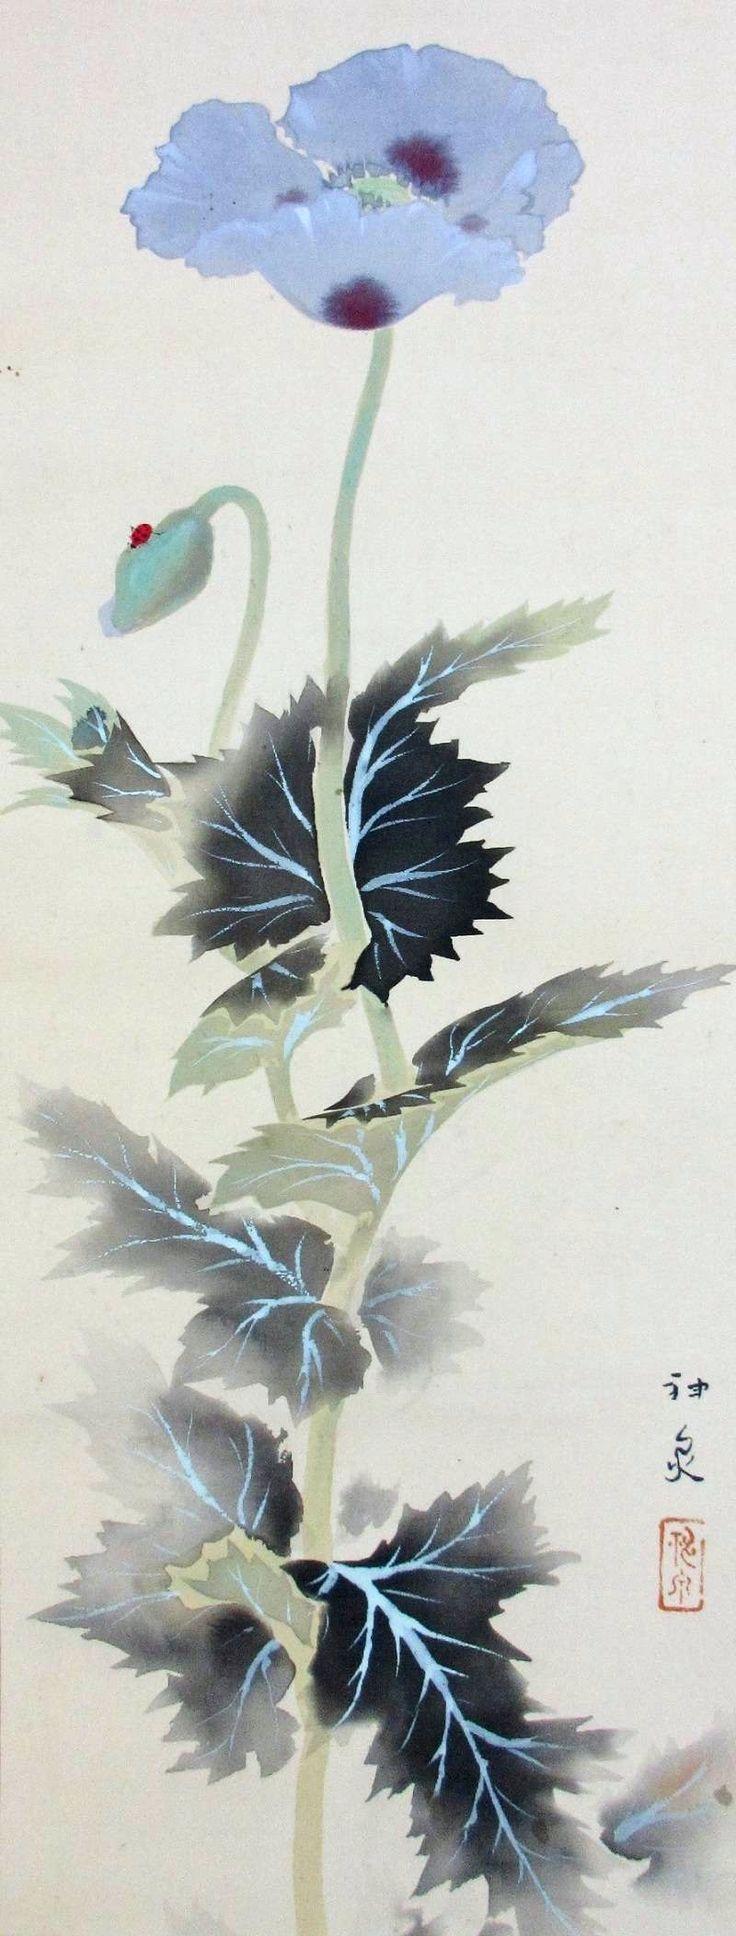 Tokuoka Shinsen 徳岡神泉 (1896-1972), flower and ladybug.